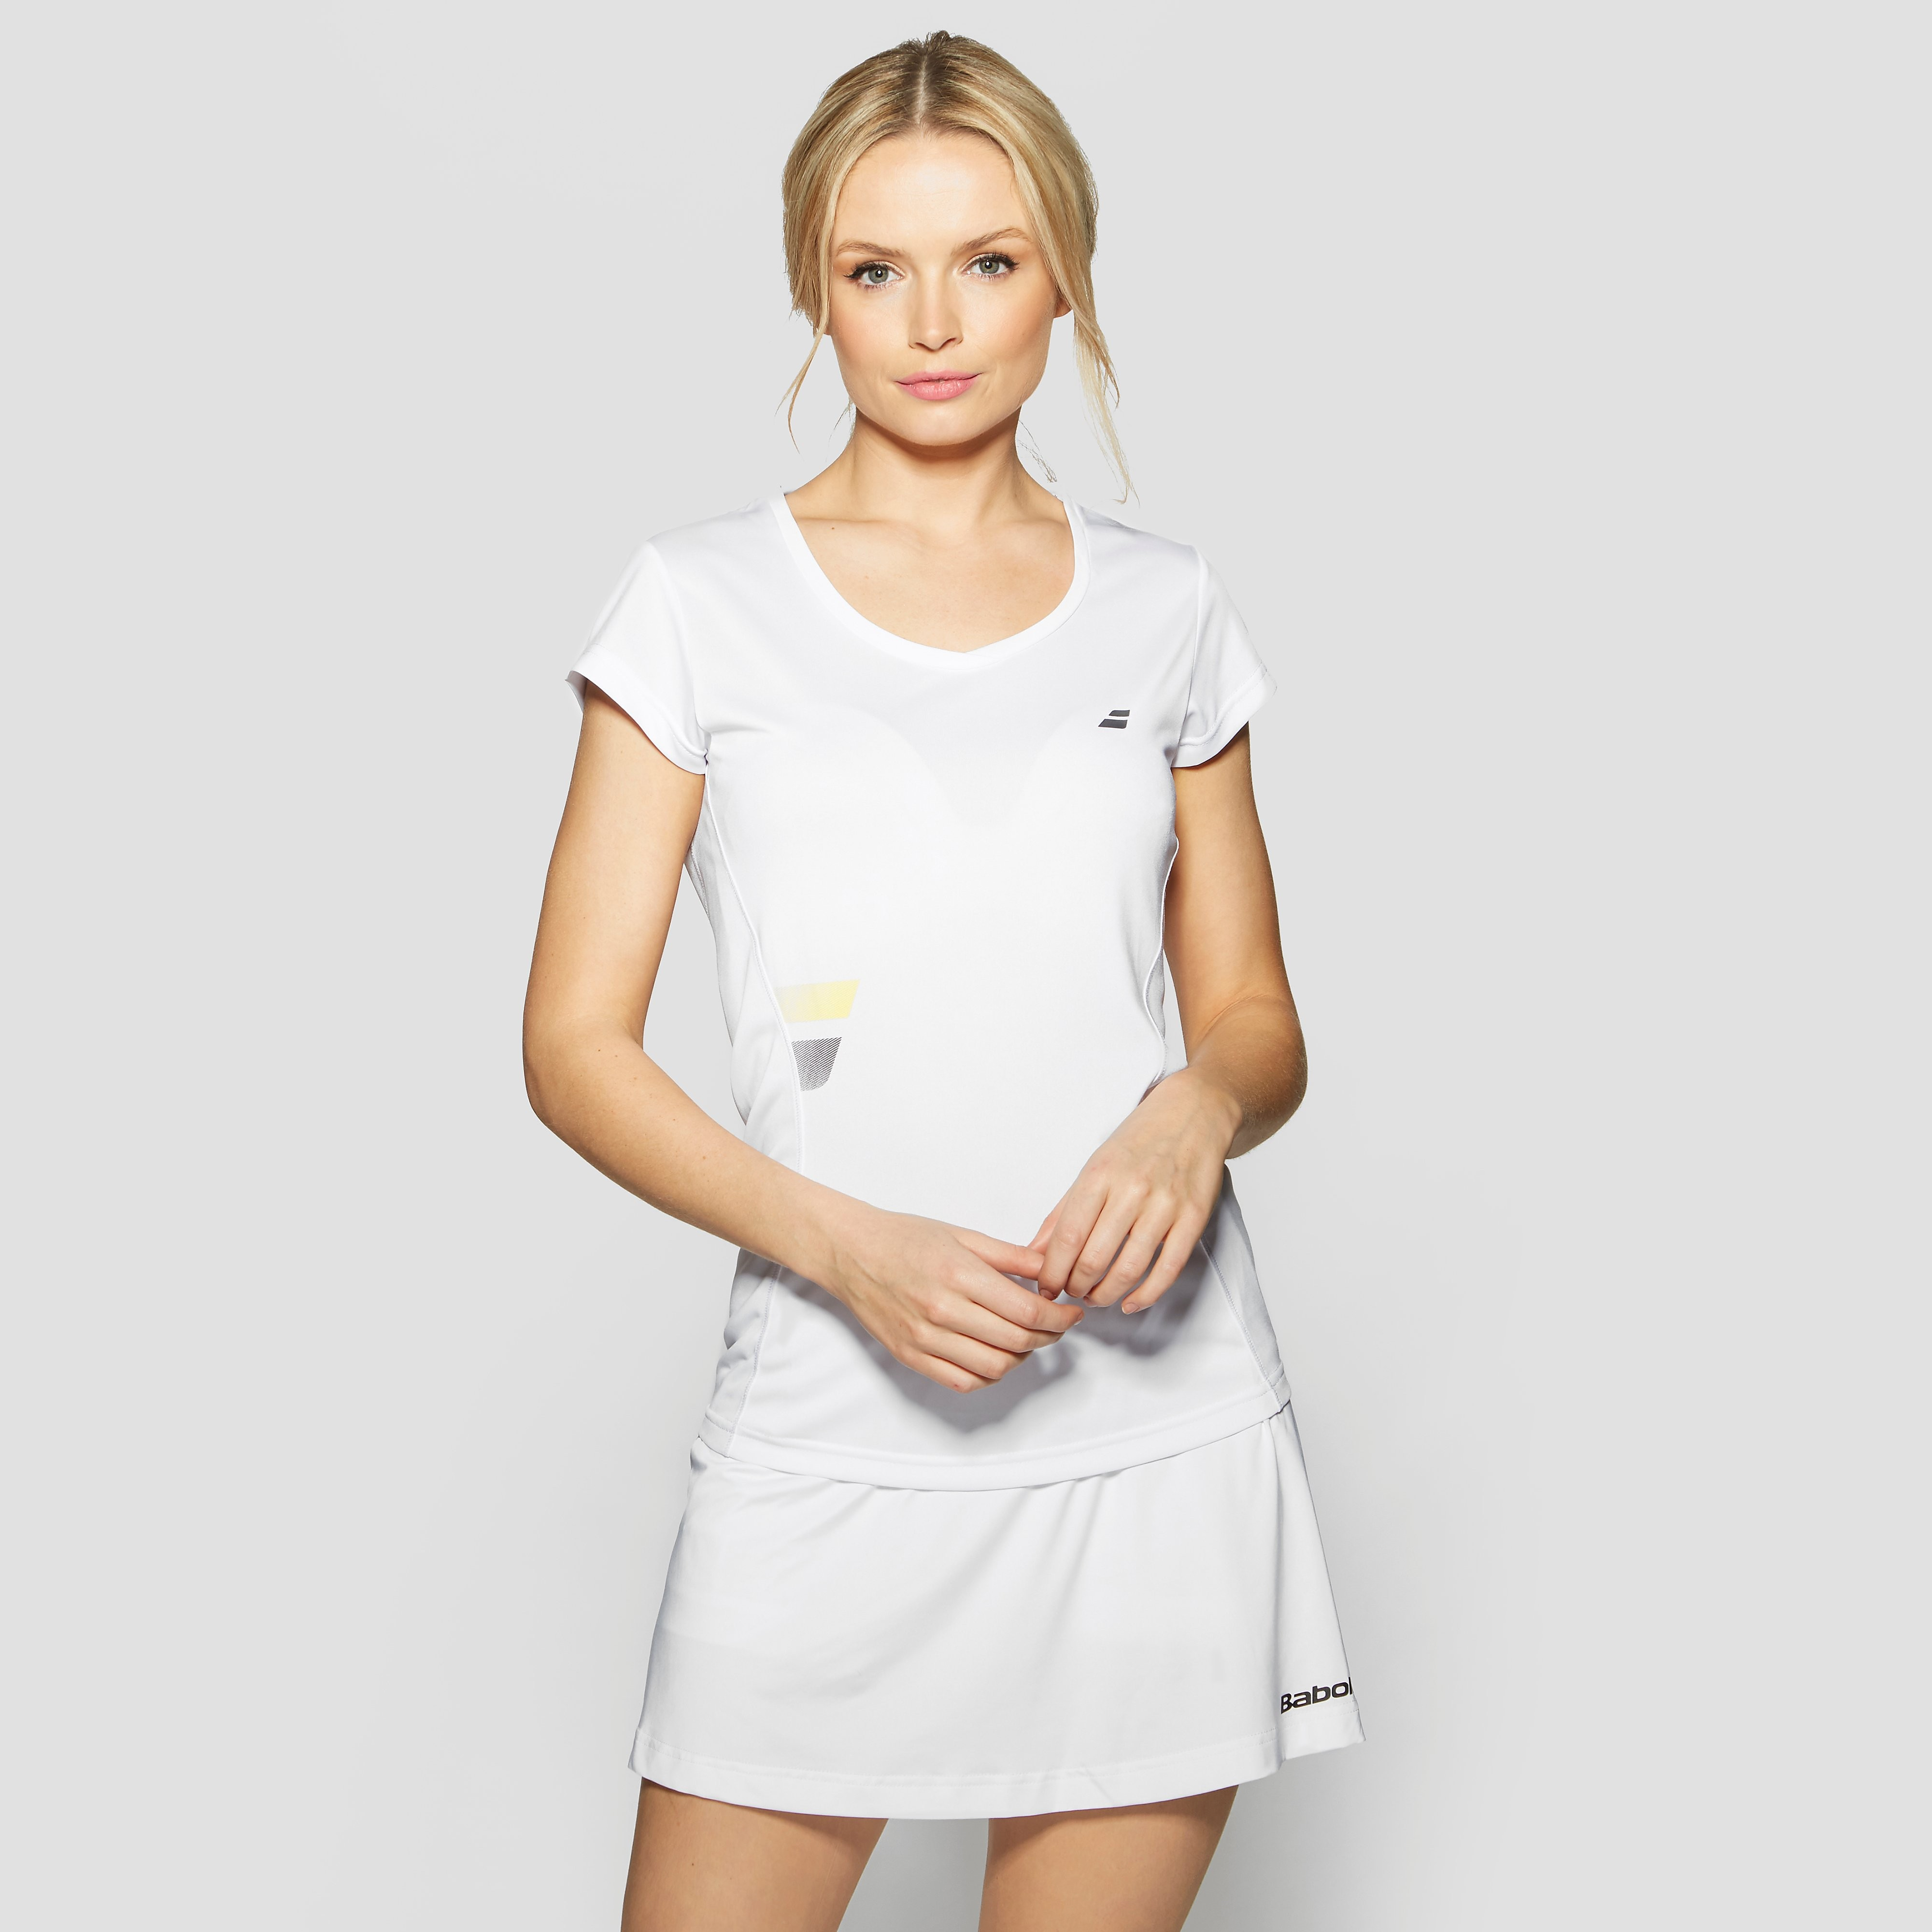 Babolat Flag Club Women's Tennis T-Shirt